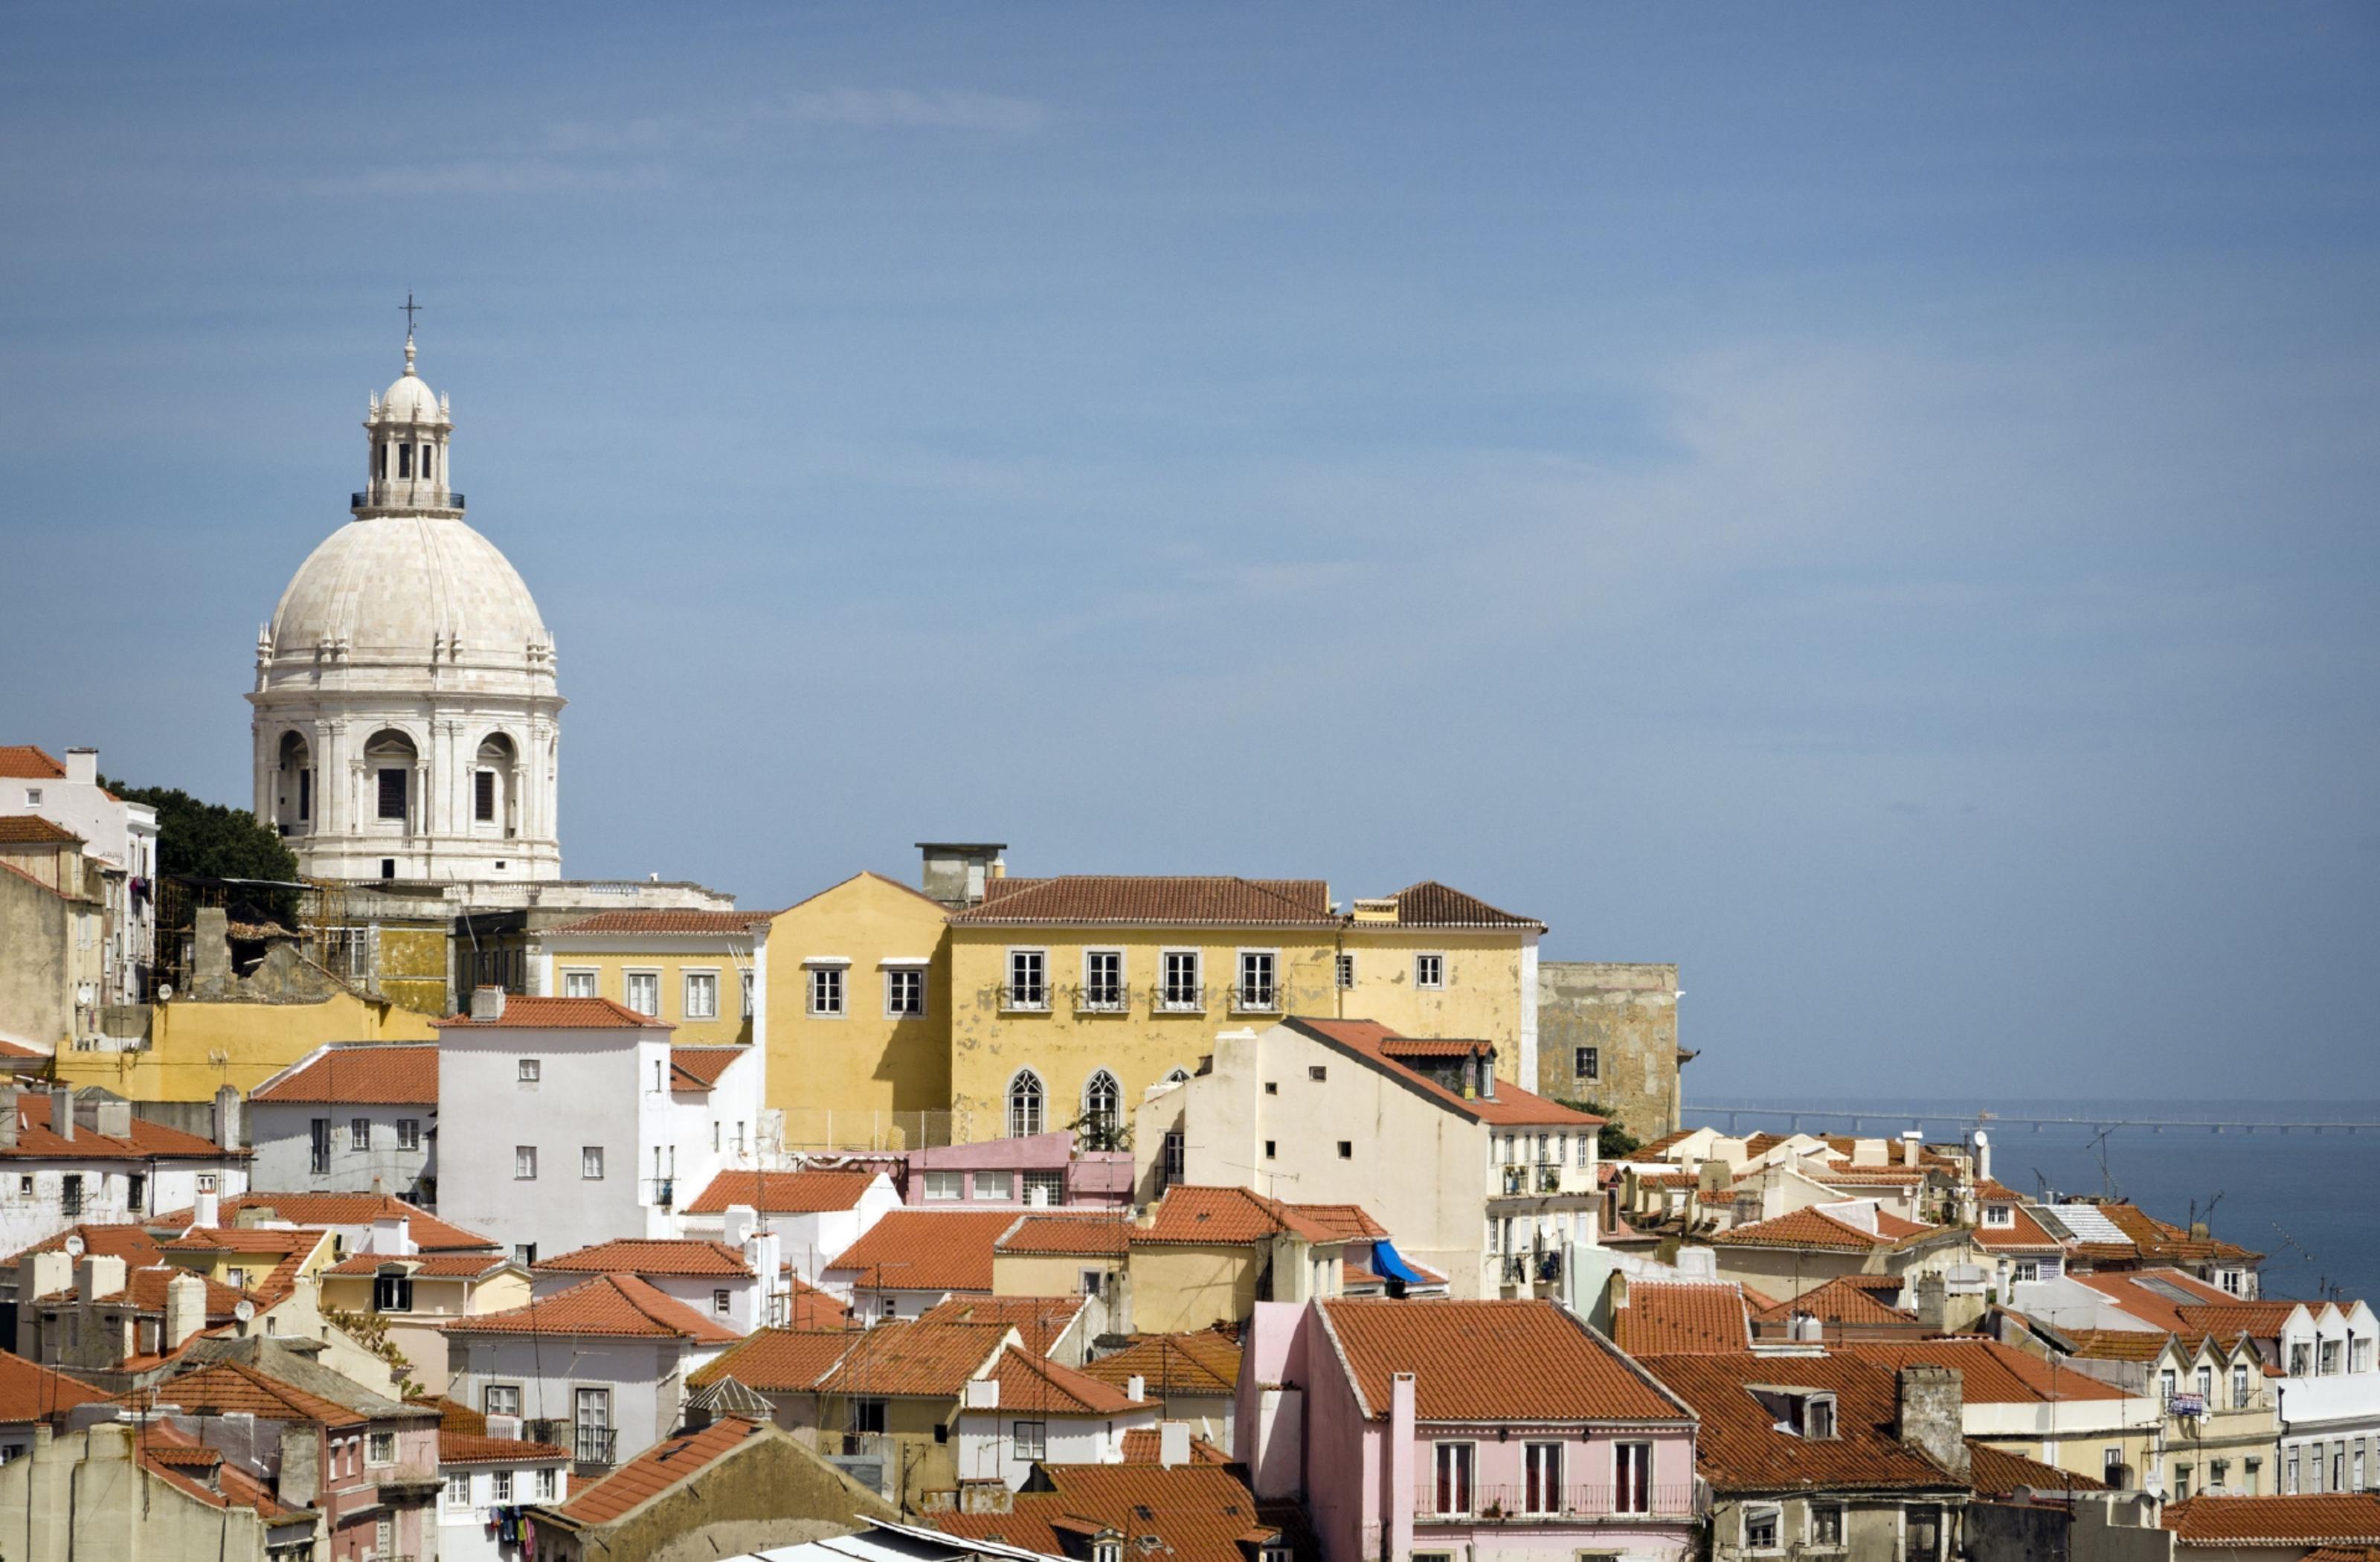 Rooftops in Lisbon.